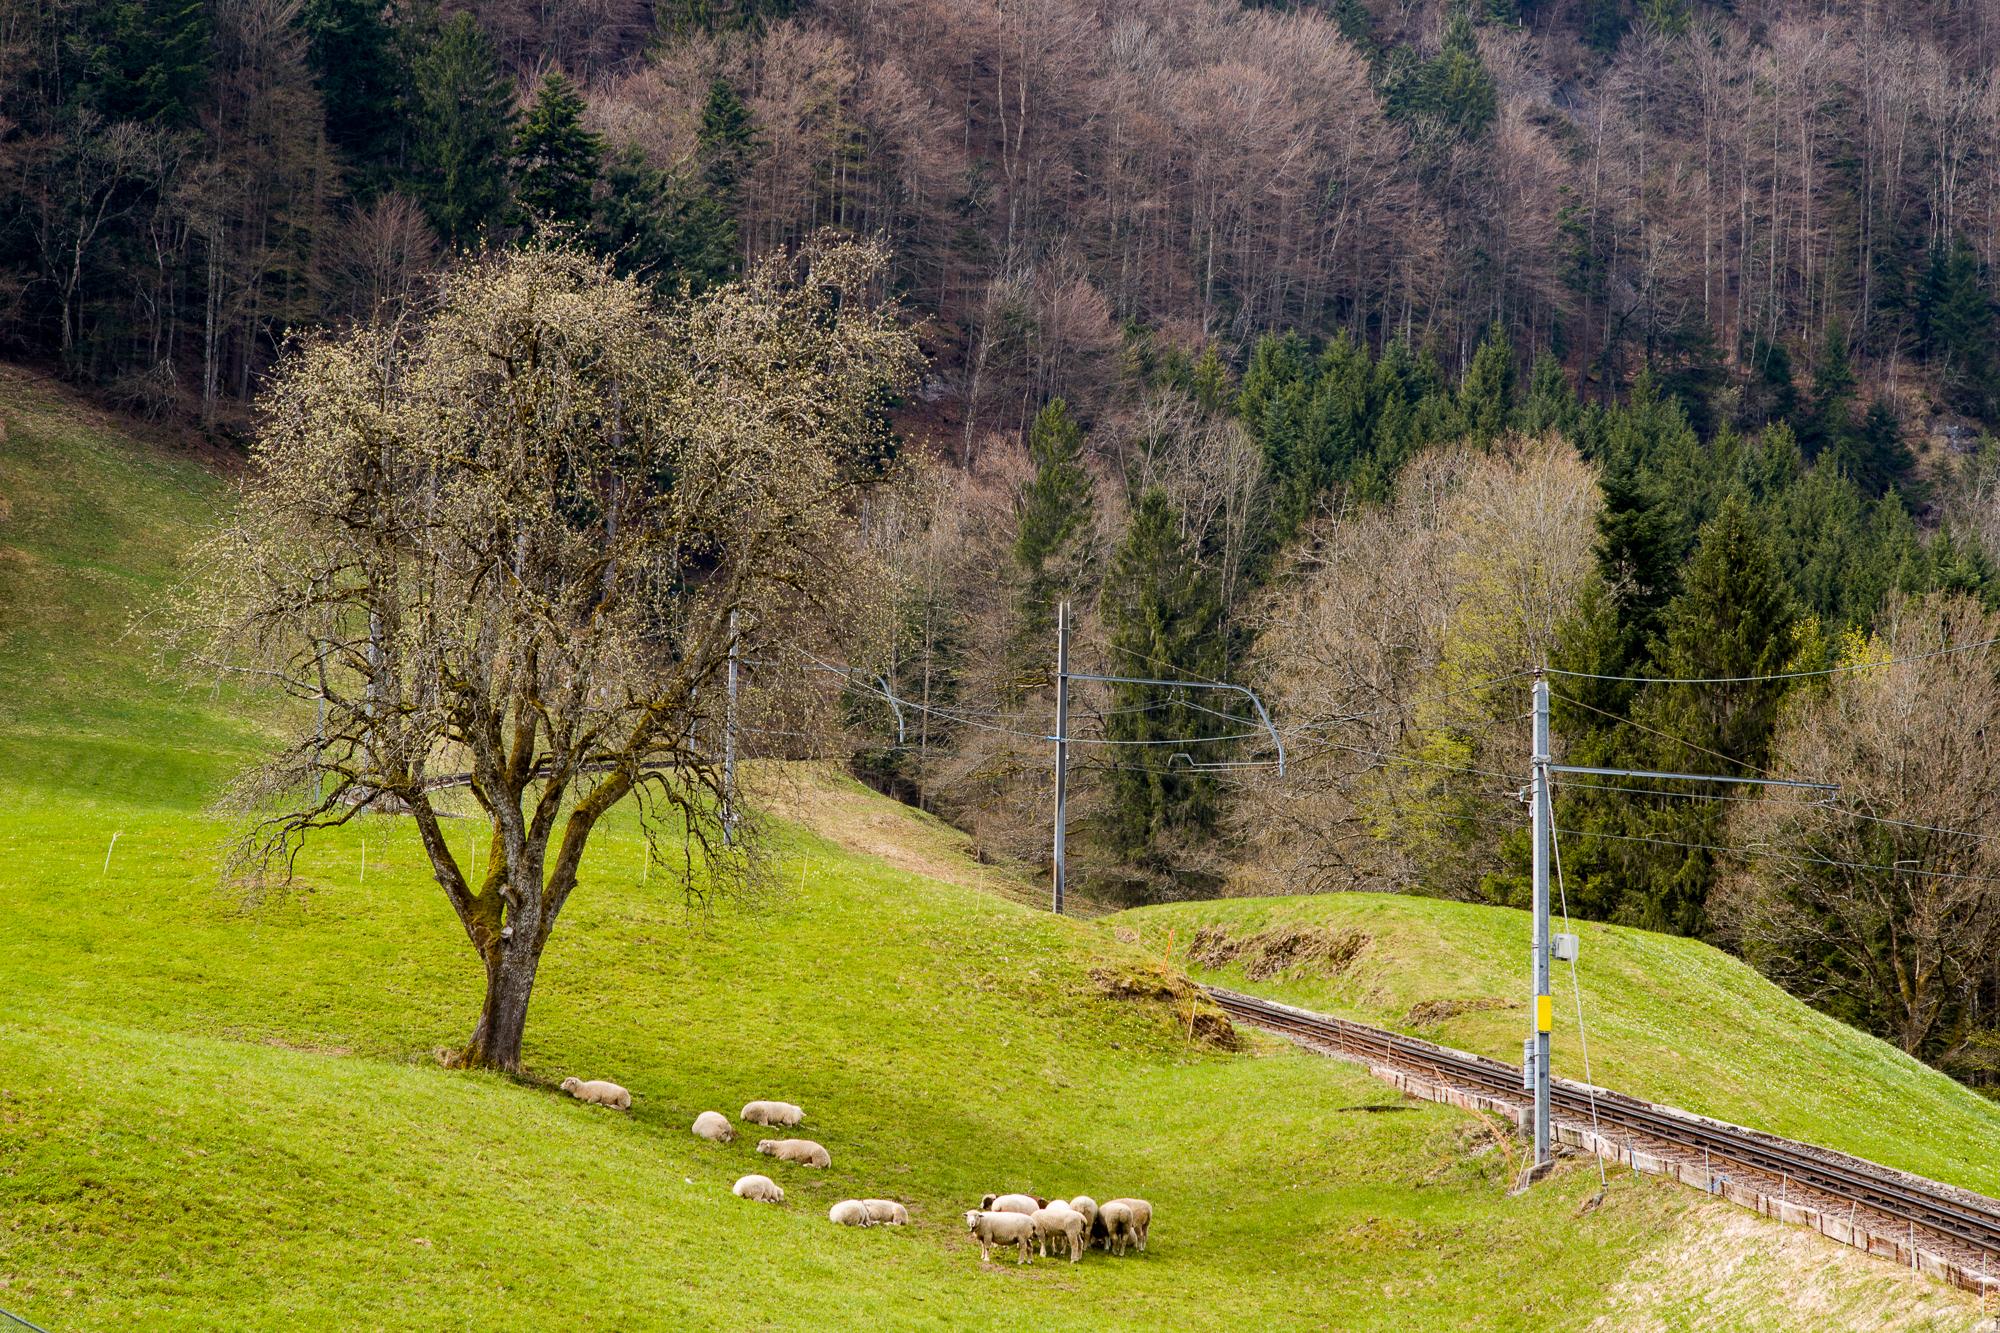 Pasture next to the Rigi Railway